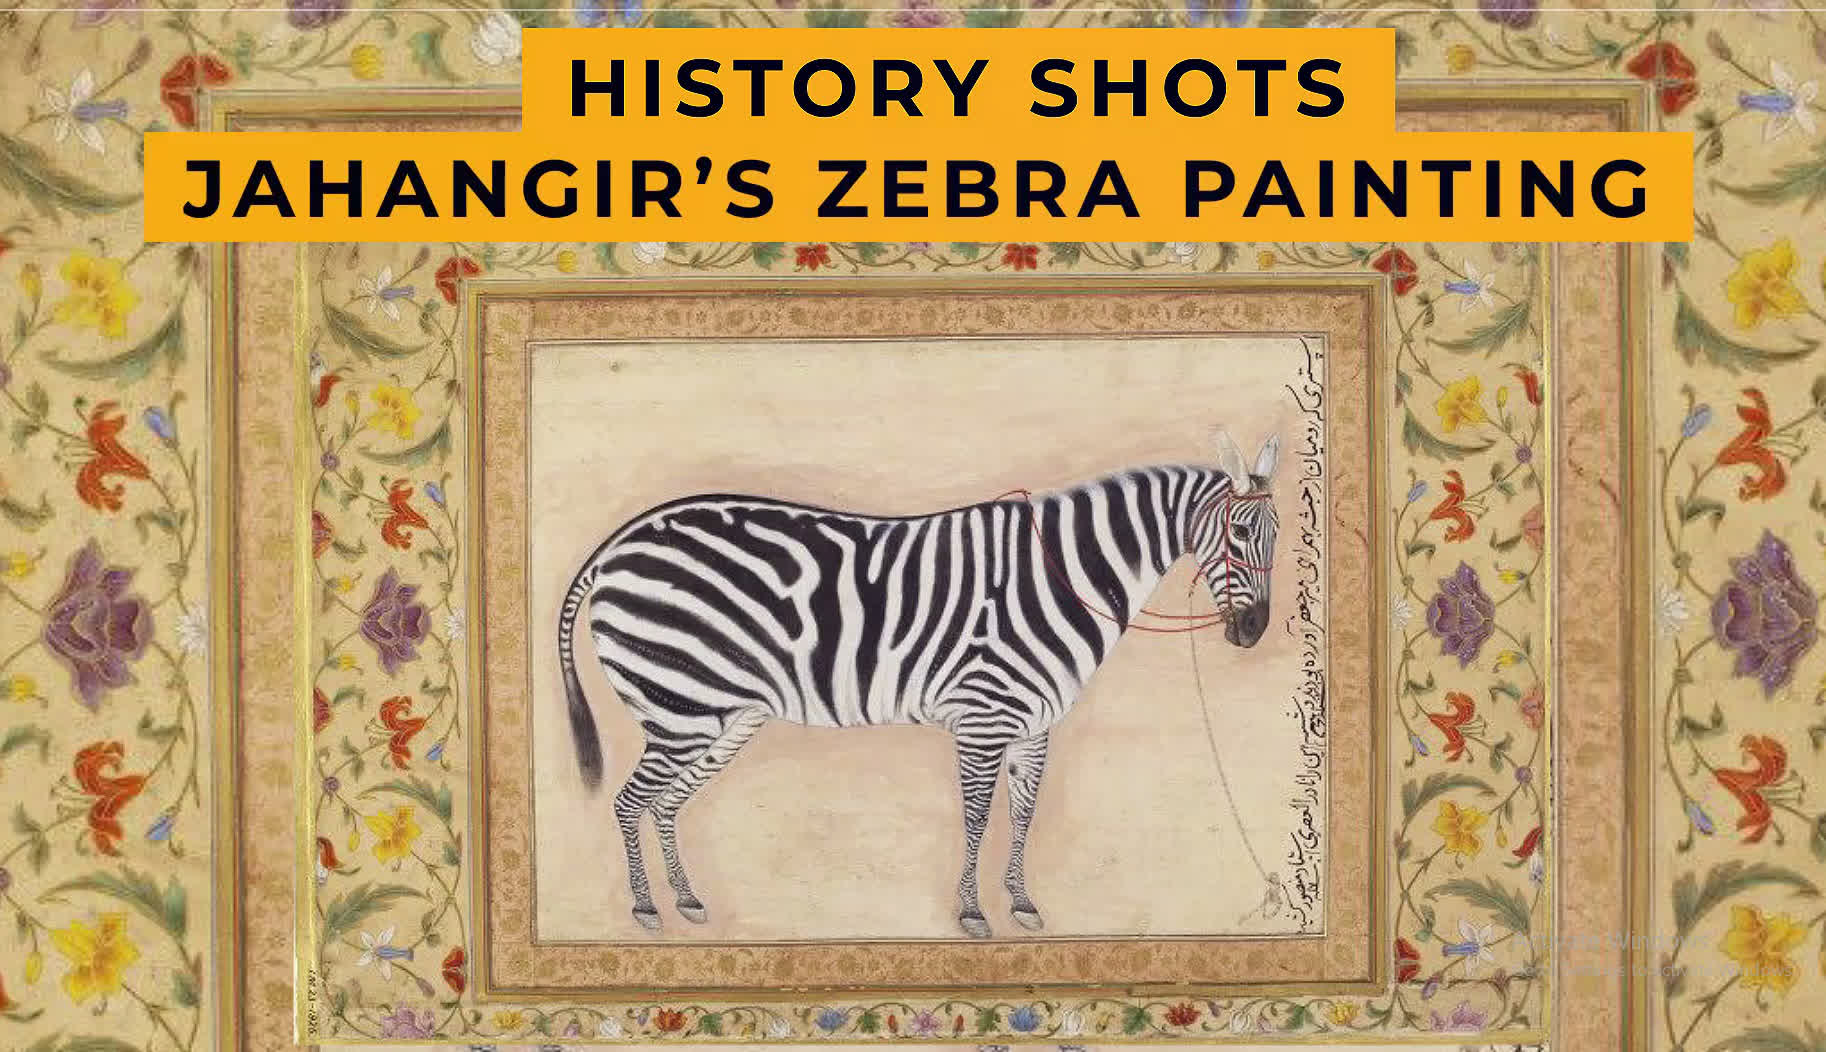 Jahangir's Zebra Painting | History Shorts